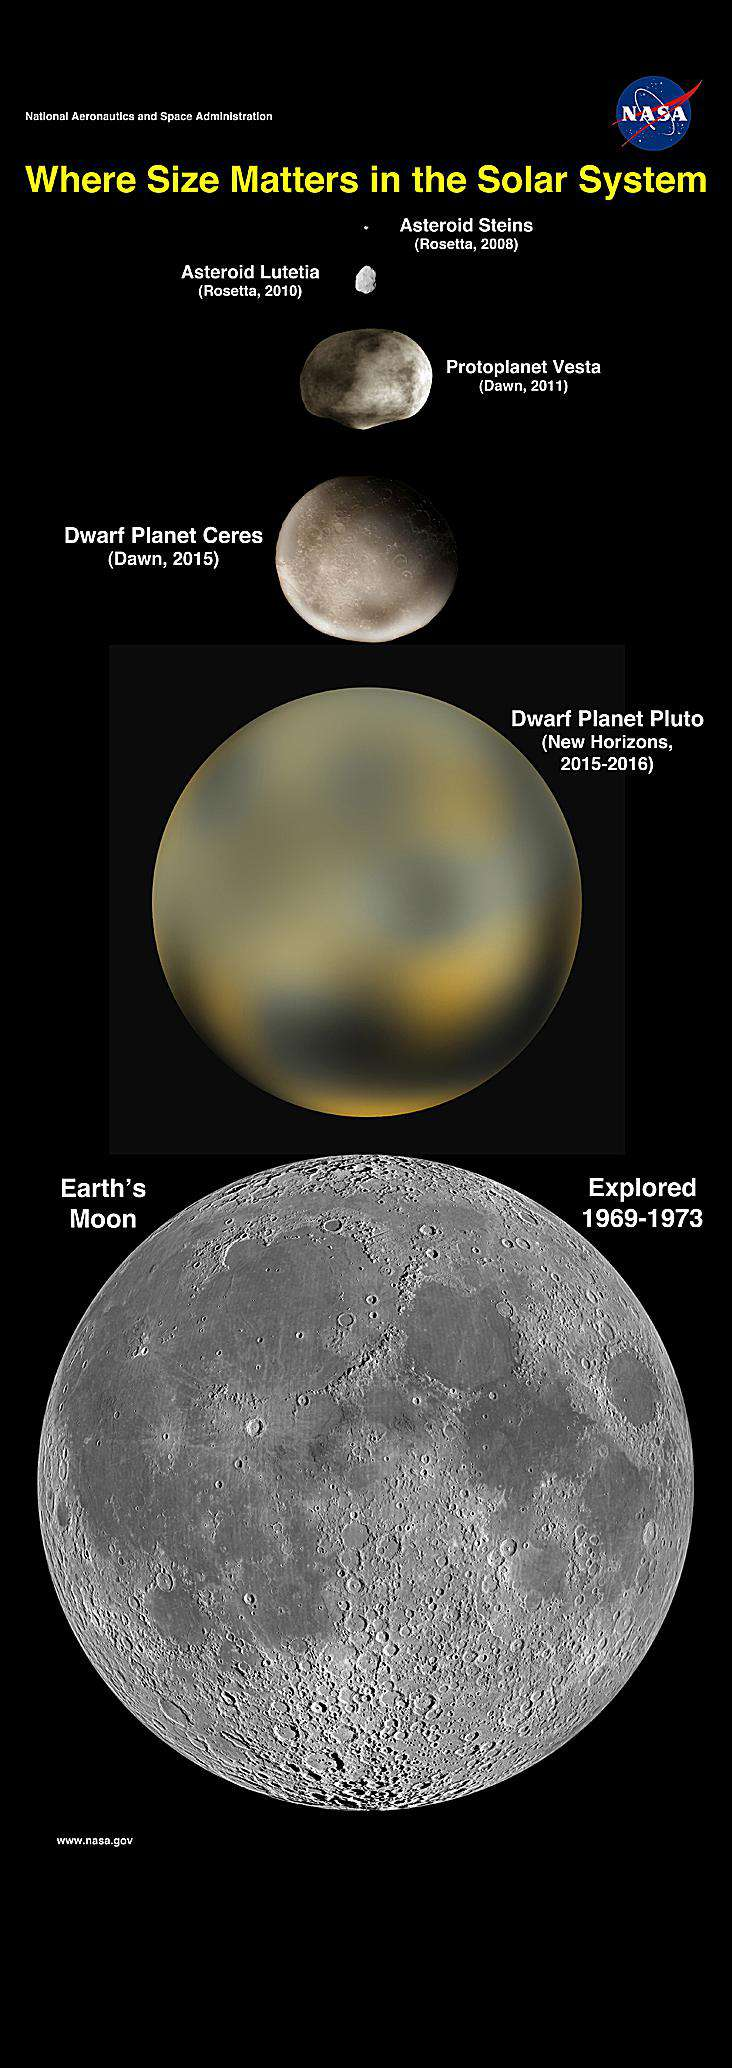 planetas, planetas enanos, plutoides, objetos transneptunianos, Plutón